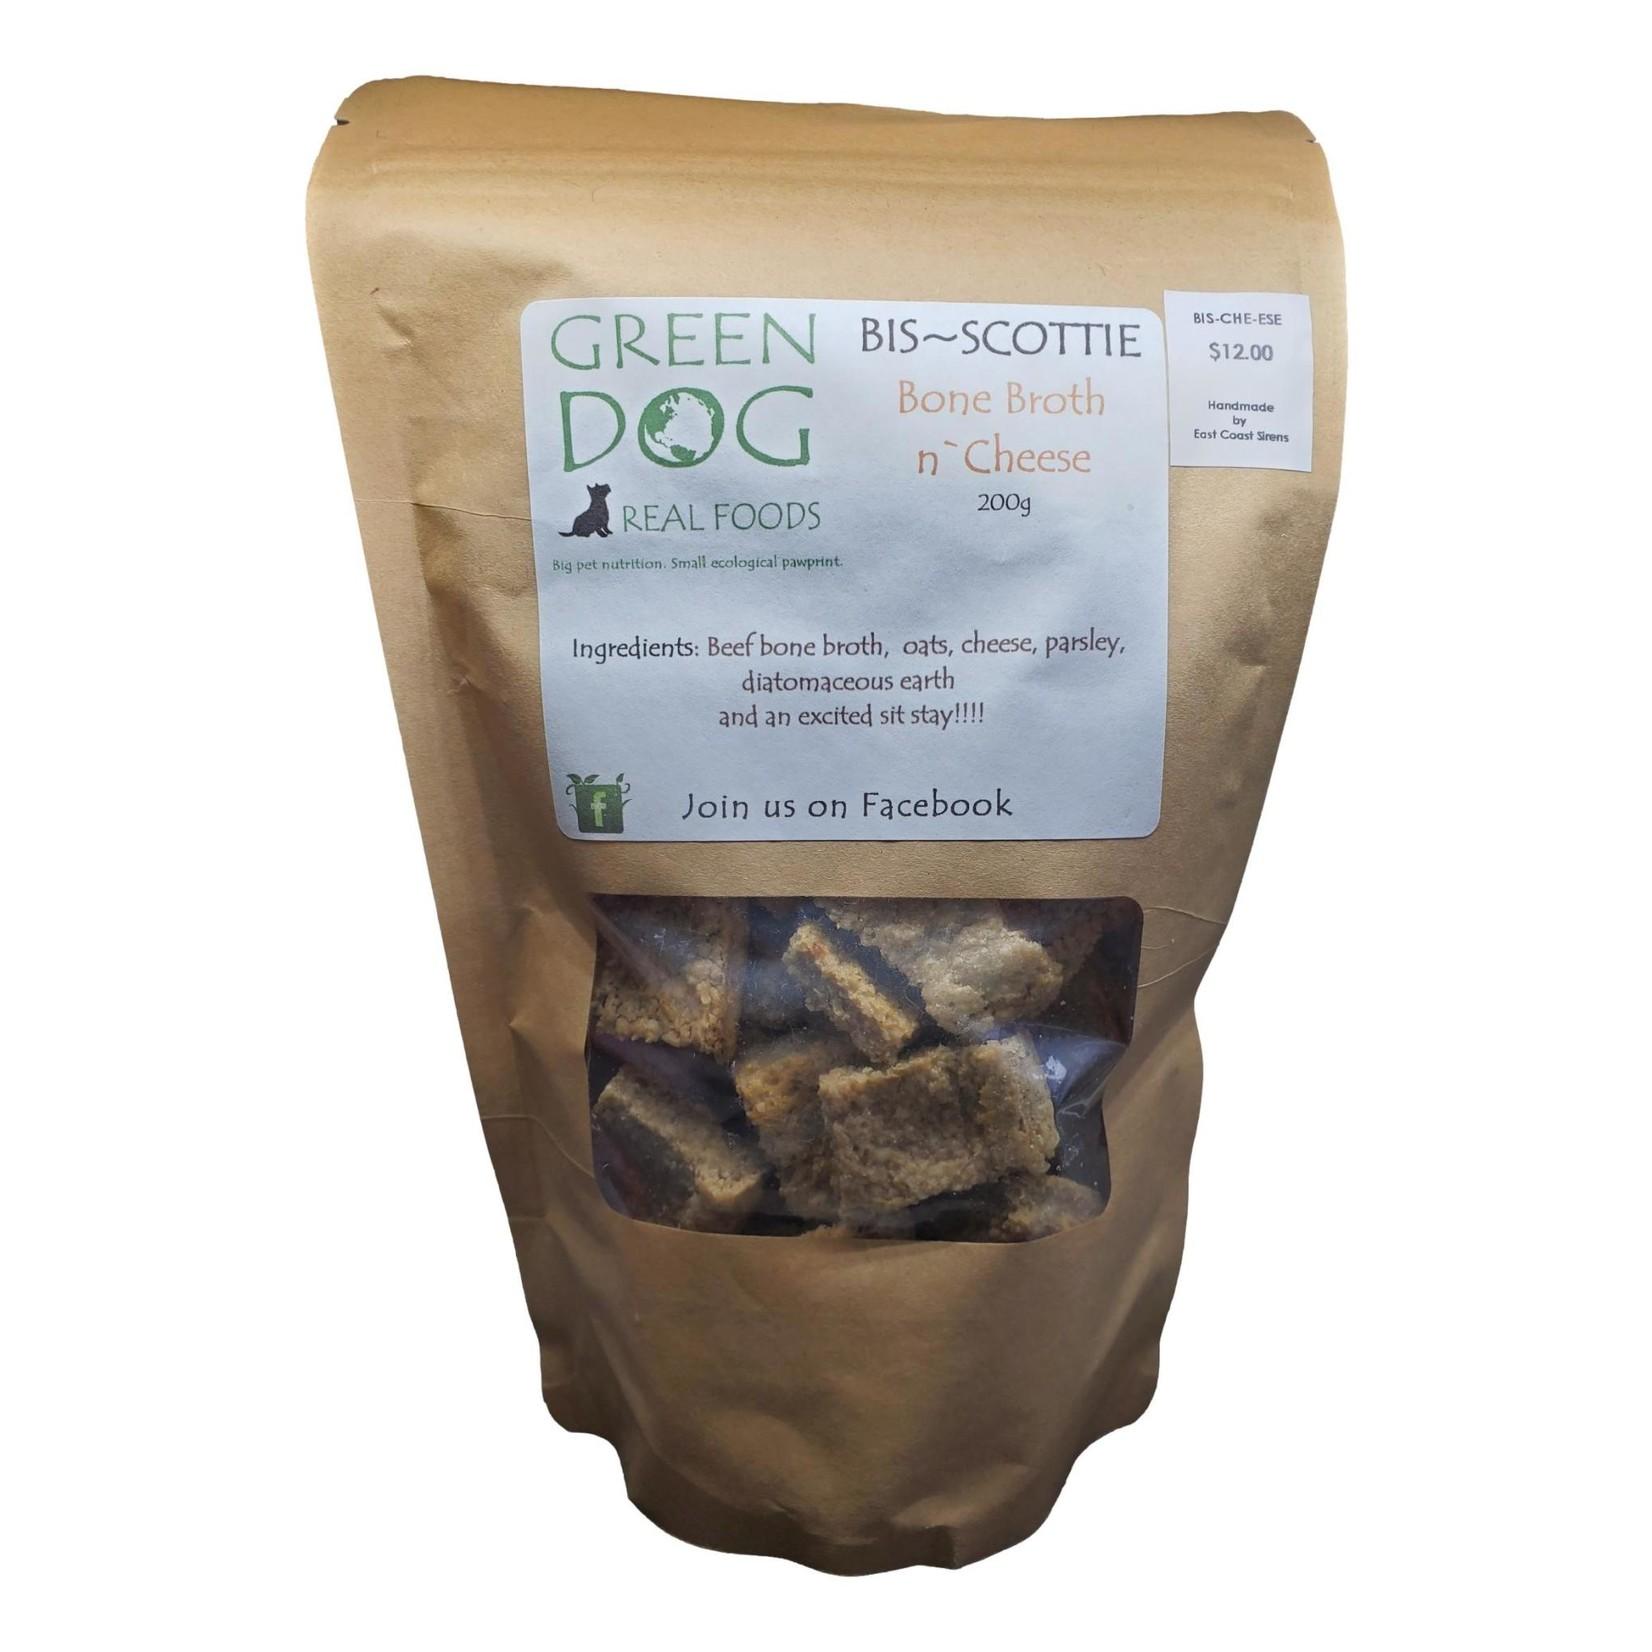 Green Dog Real Foods Bis~Scotties Treats- Bone, Broth, Cheese